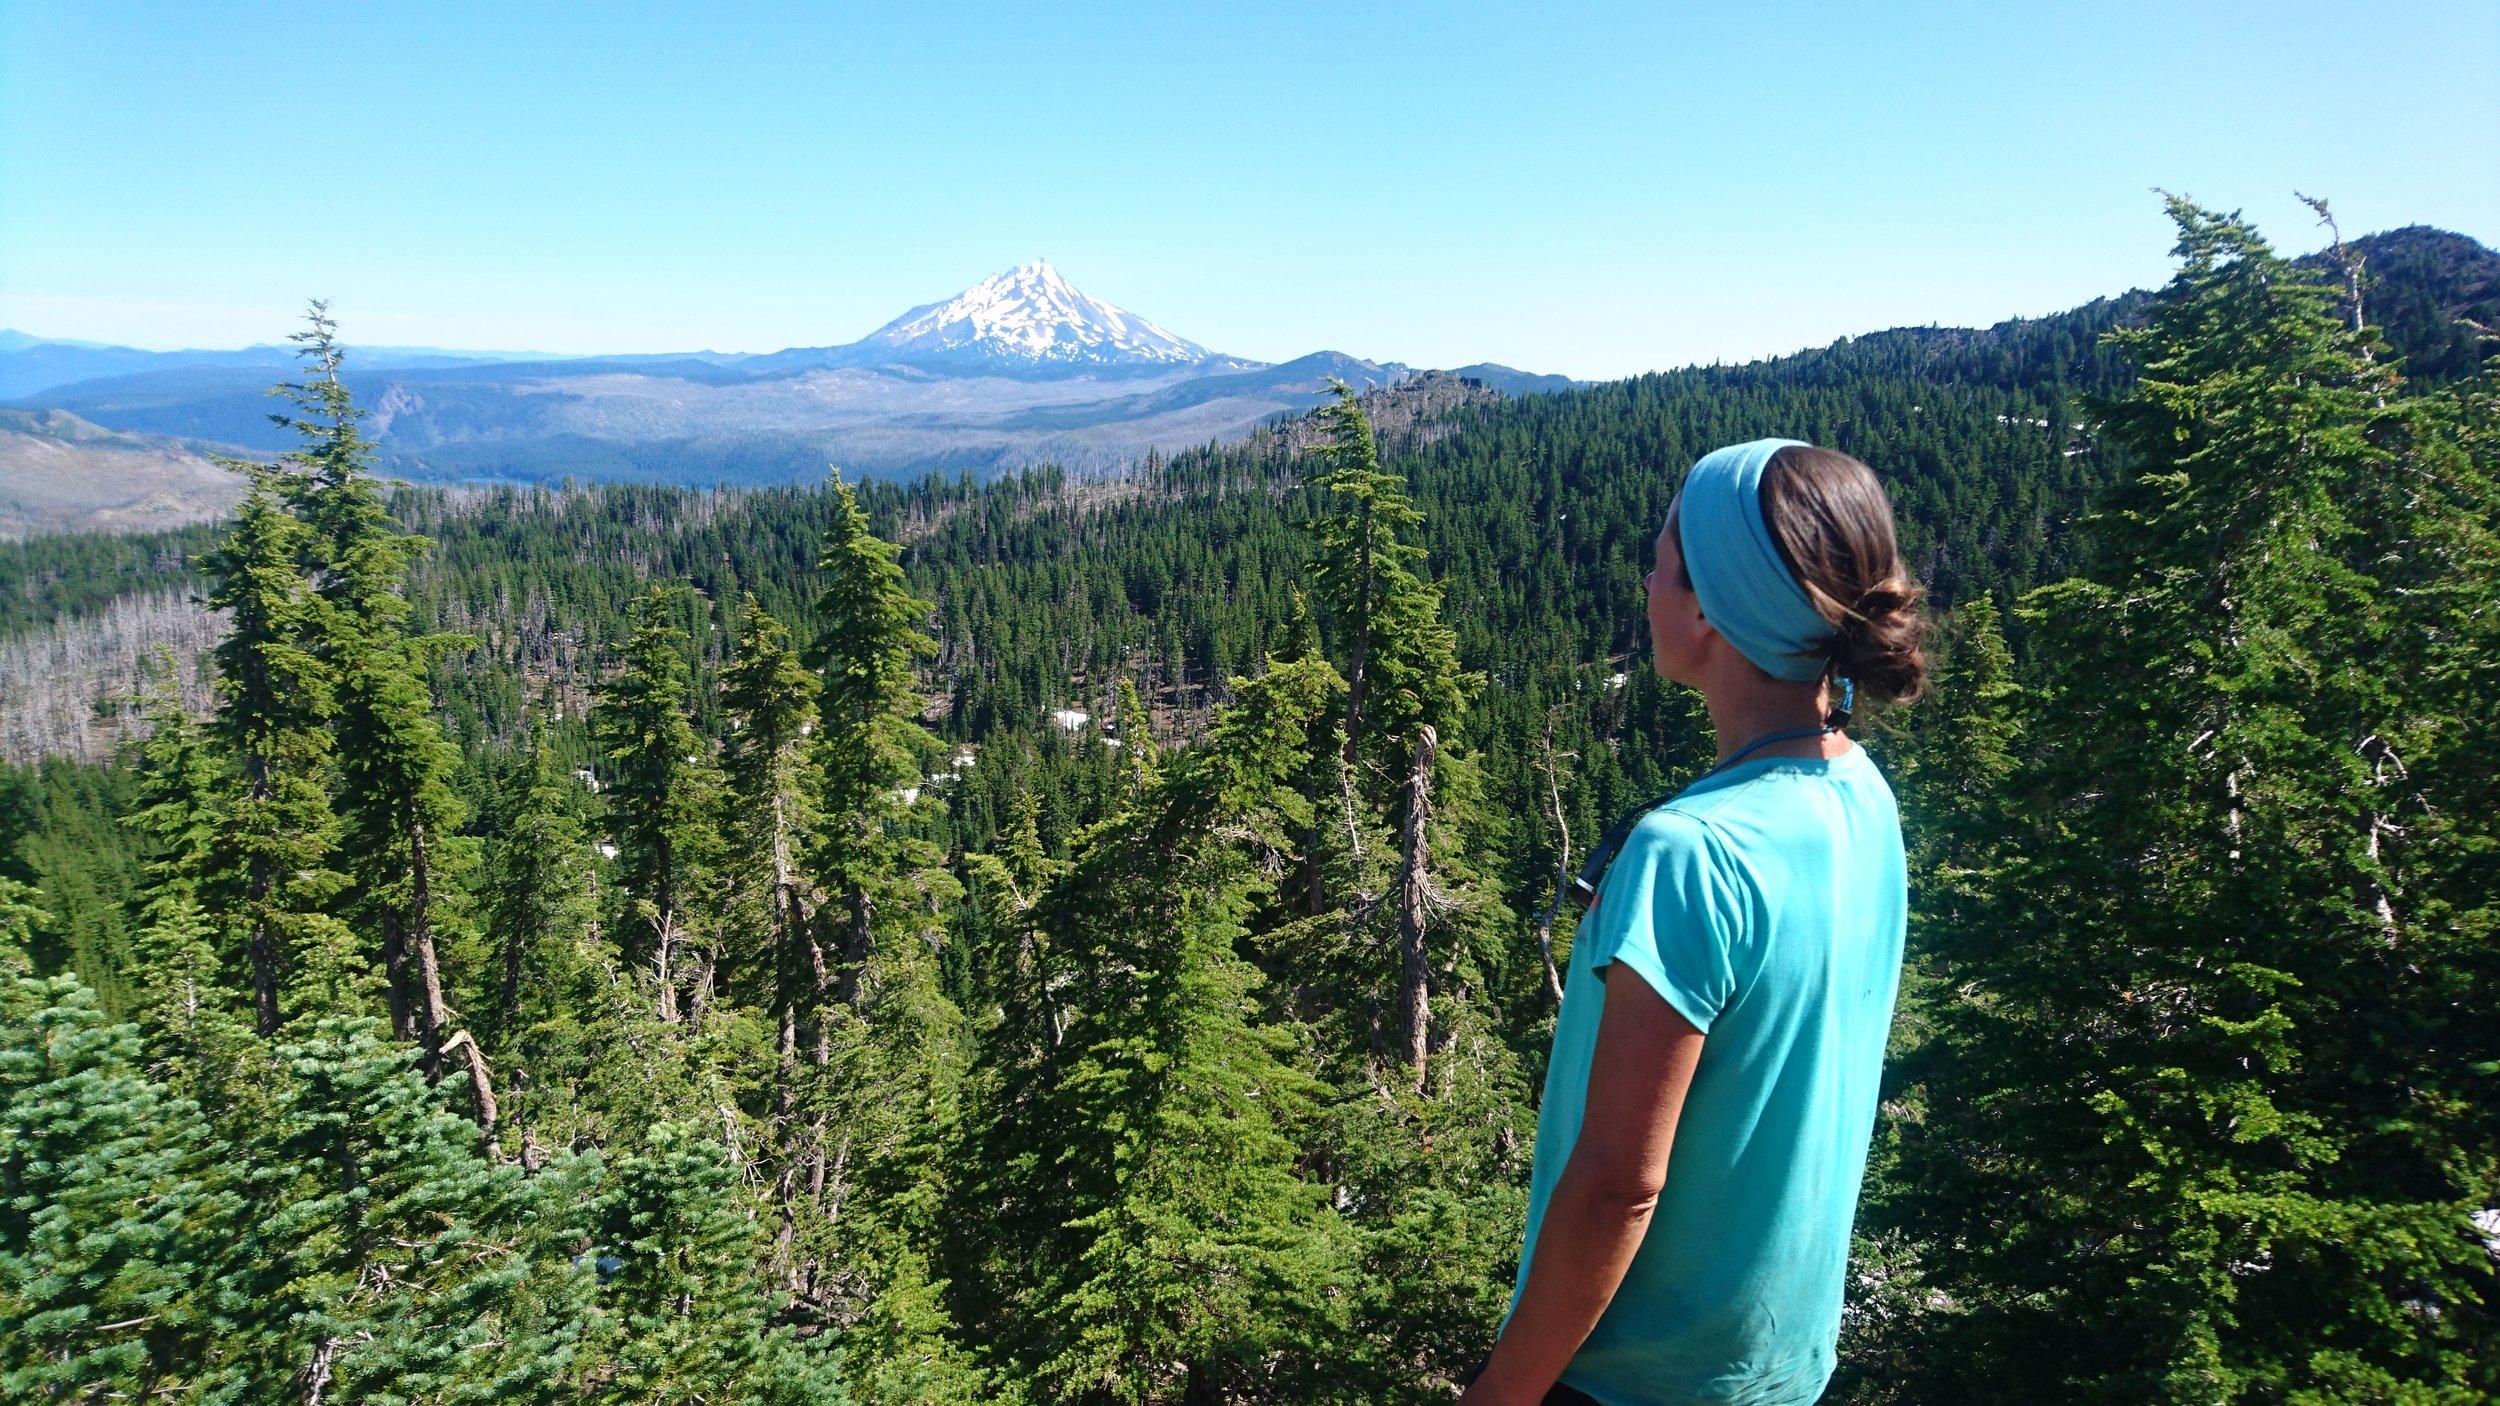 Mt. Jefferson far away